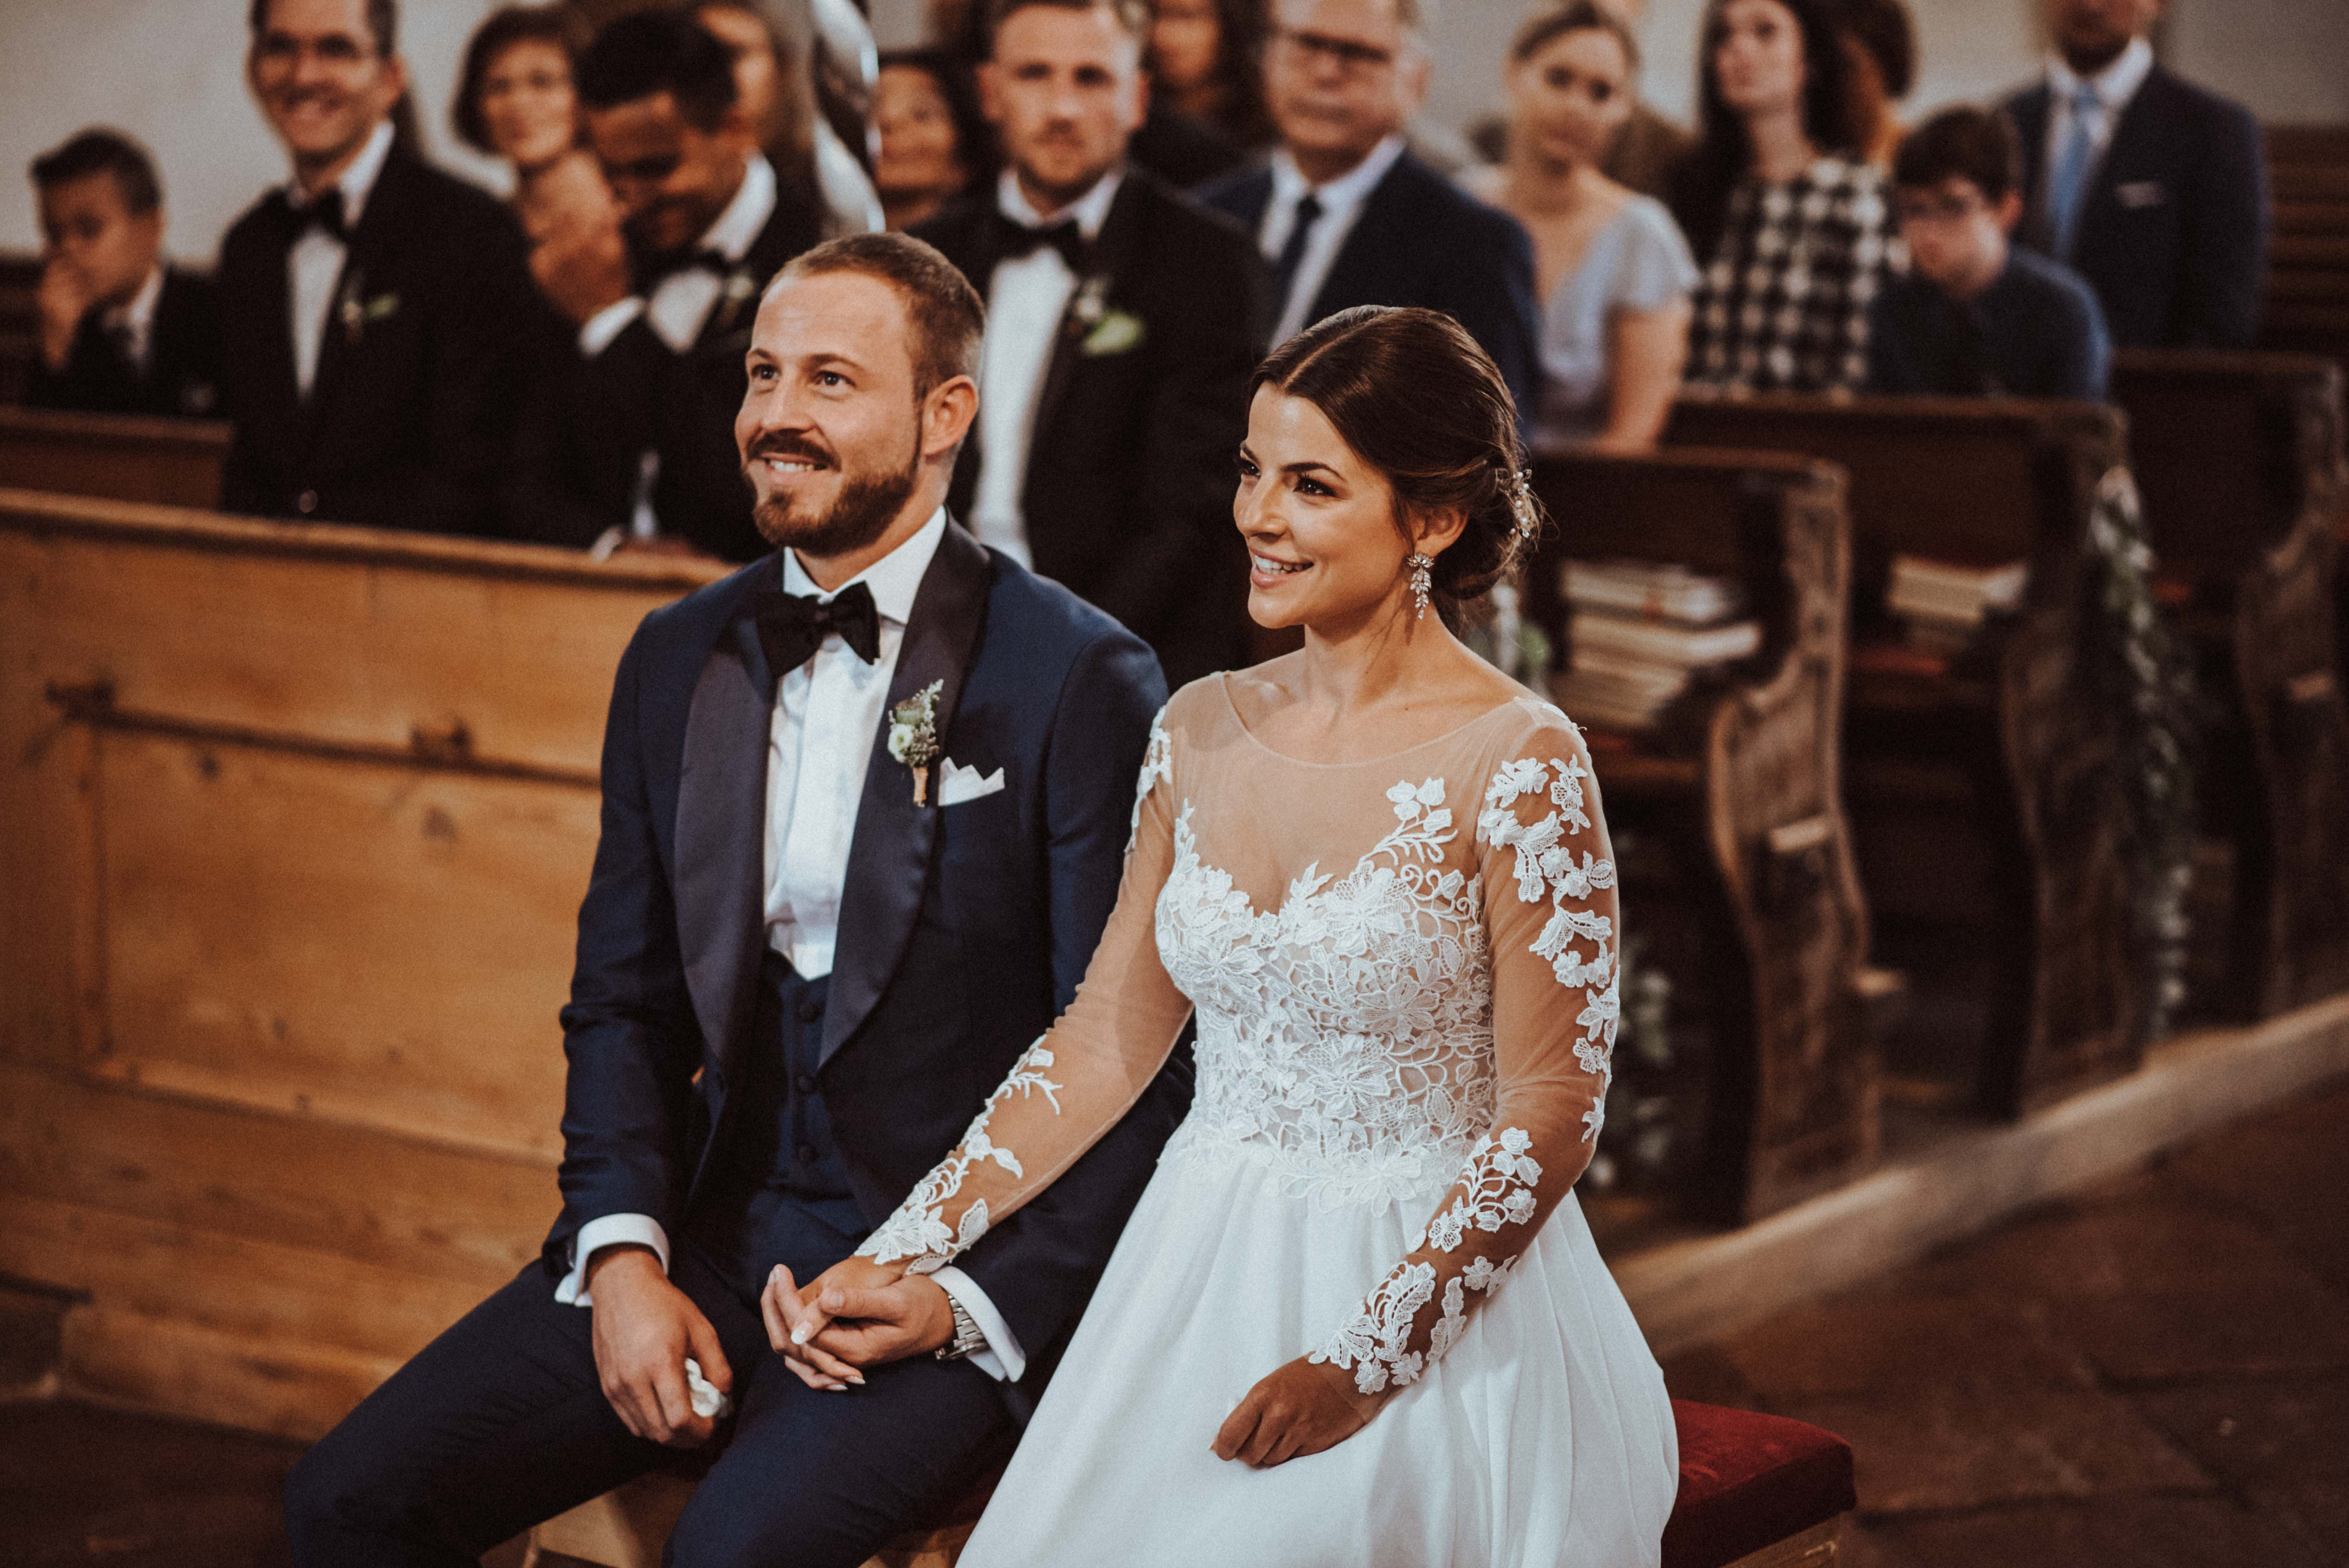 aufgeregt trauung Sonja Pöhlmann Photography Wedding München Bayern